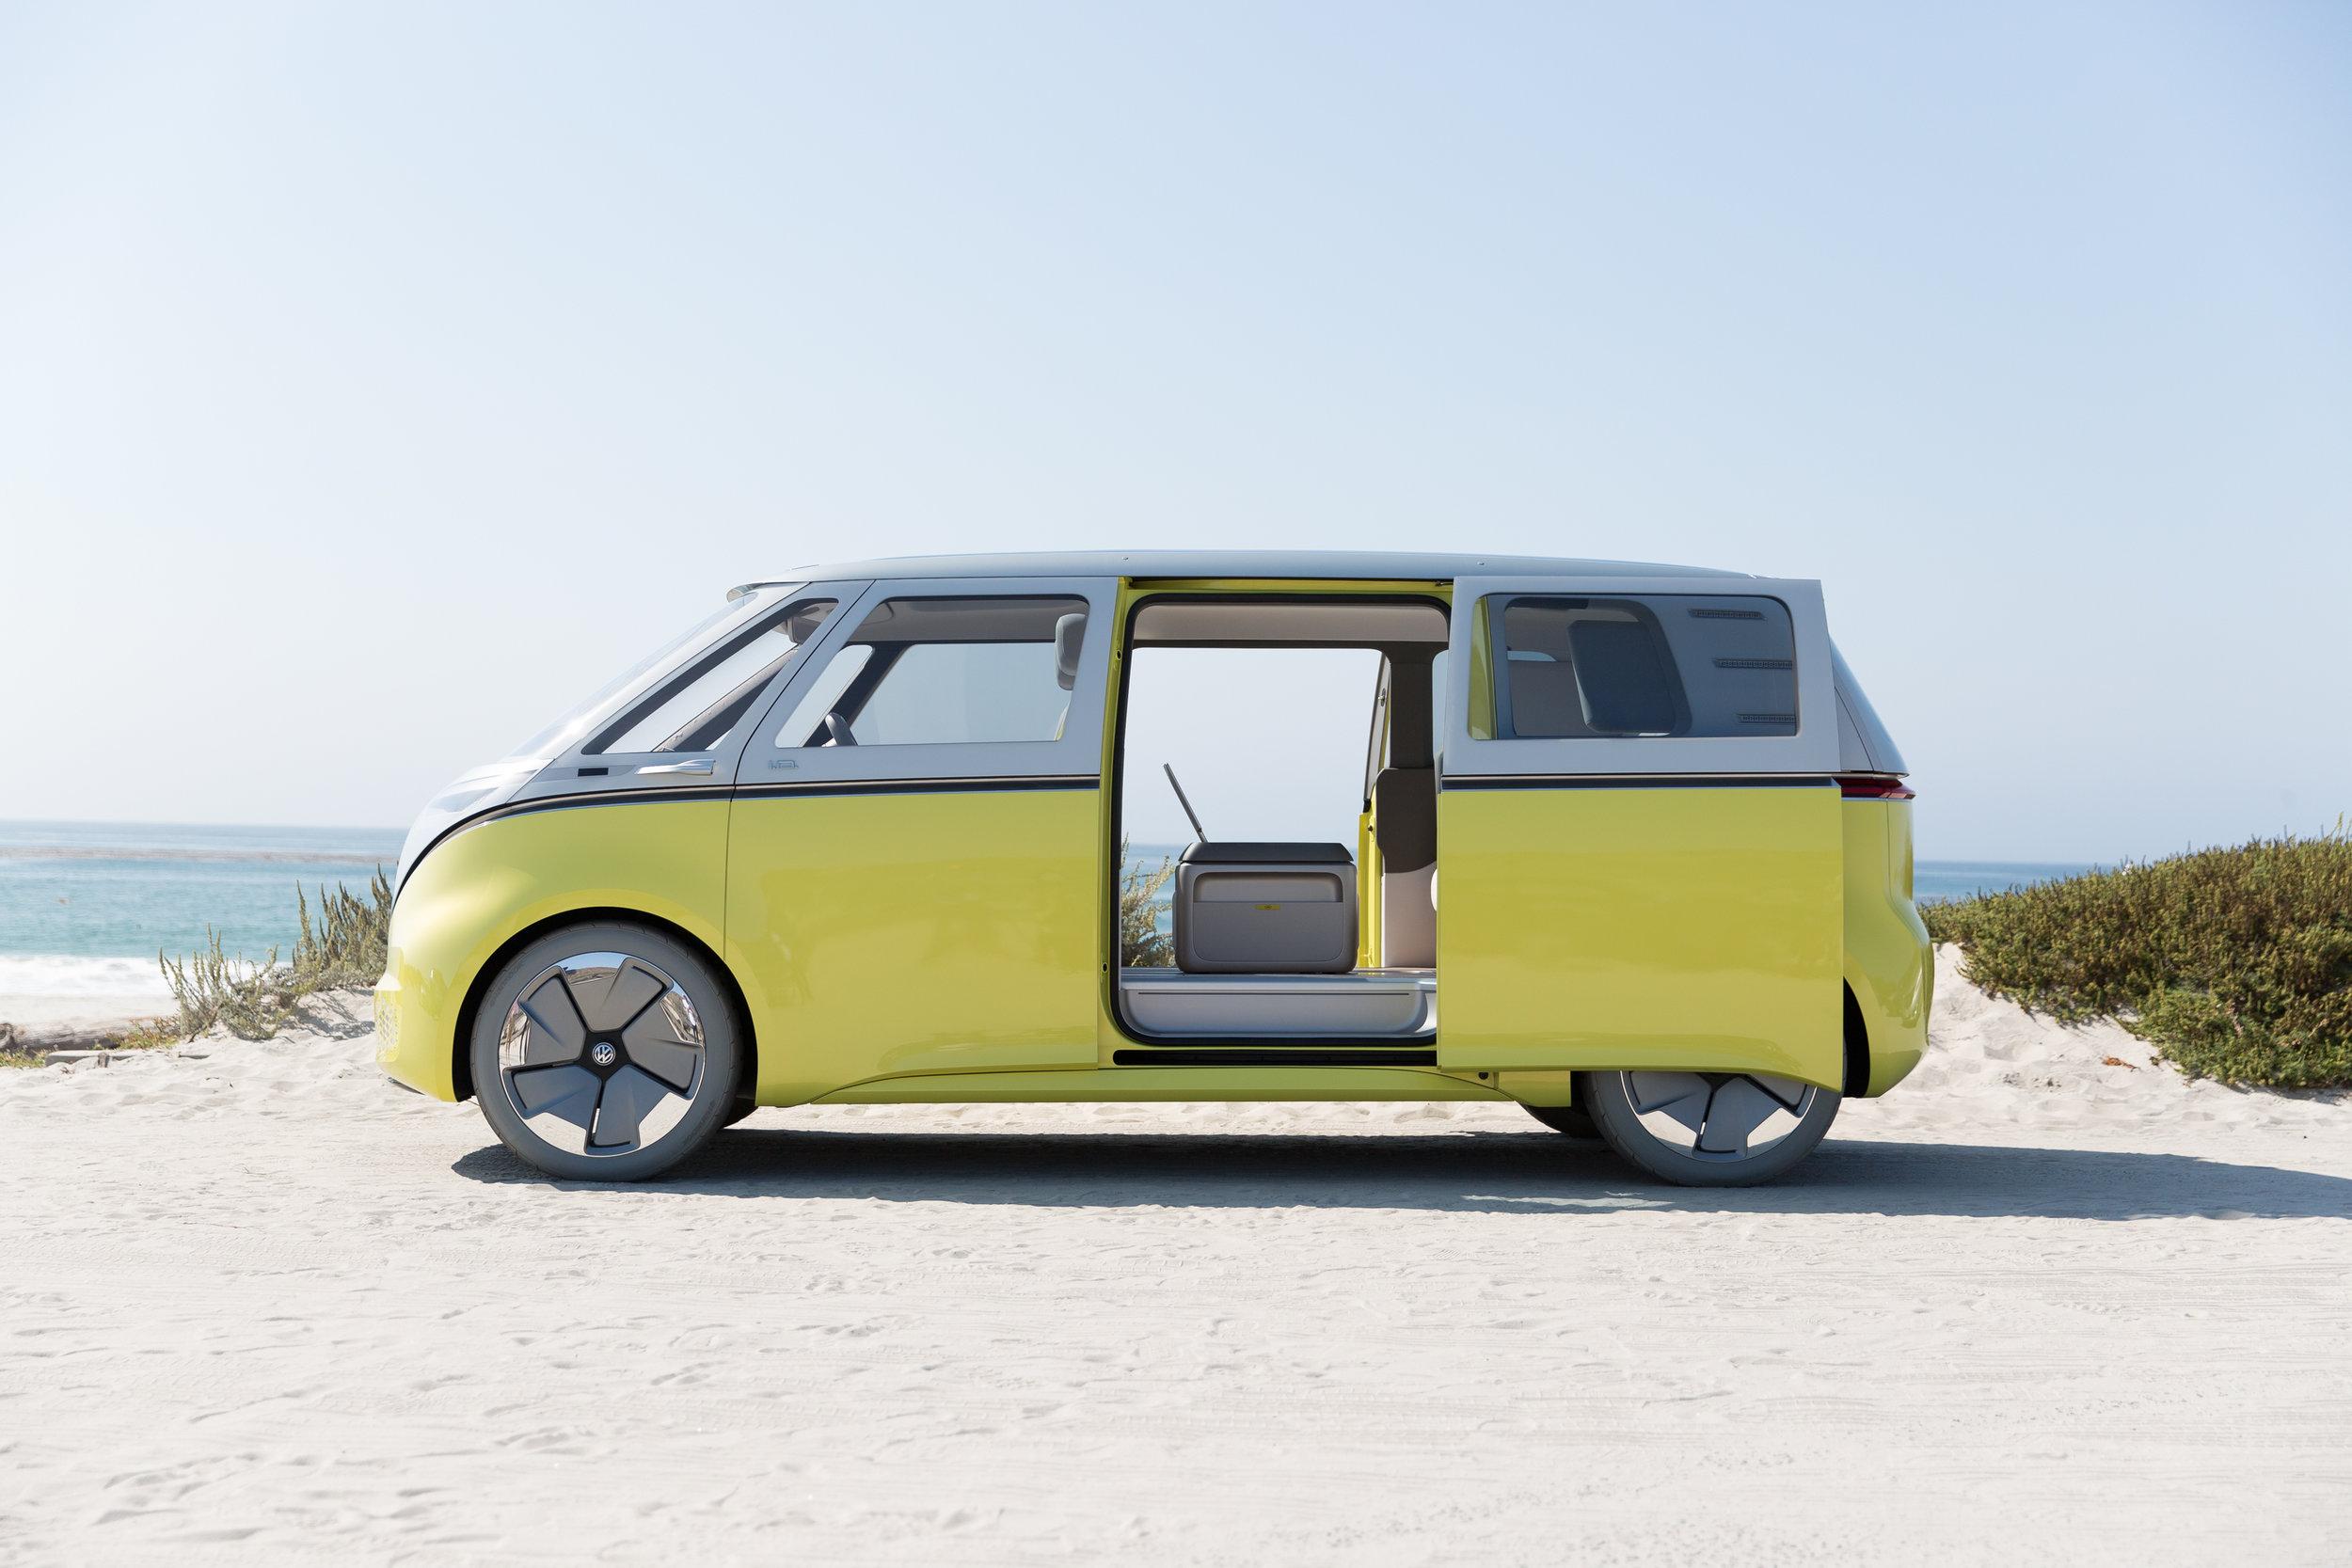 Stay_Driven_Monterey_VW-2.jpg